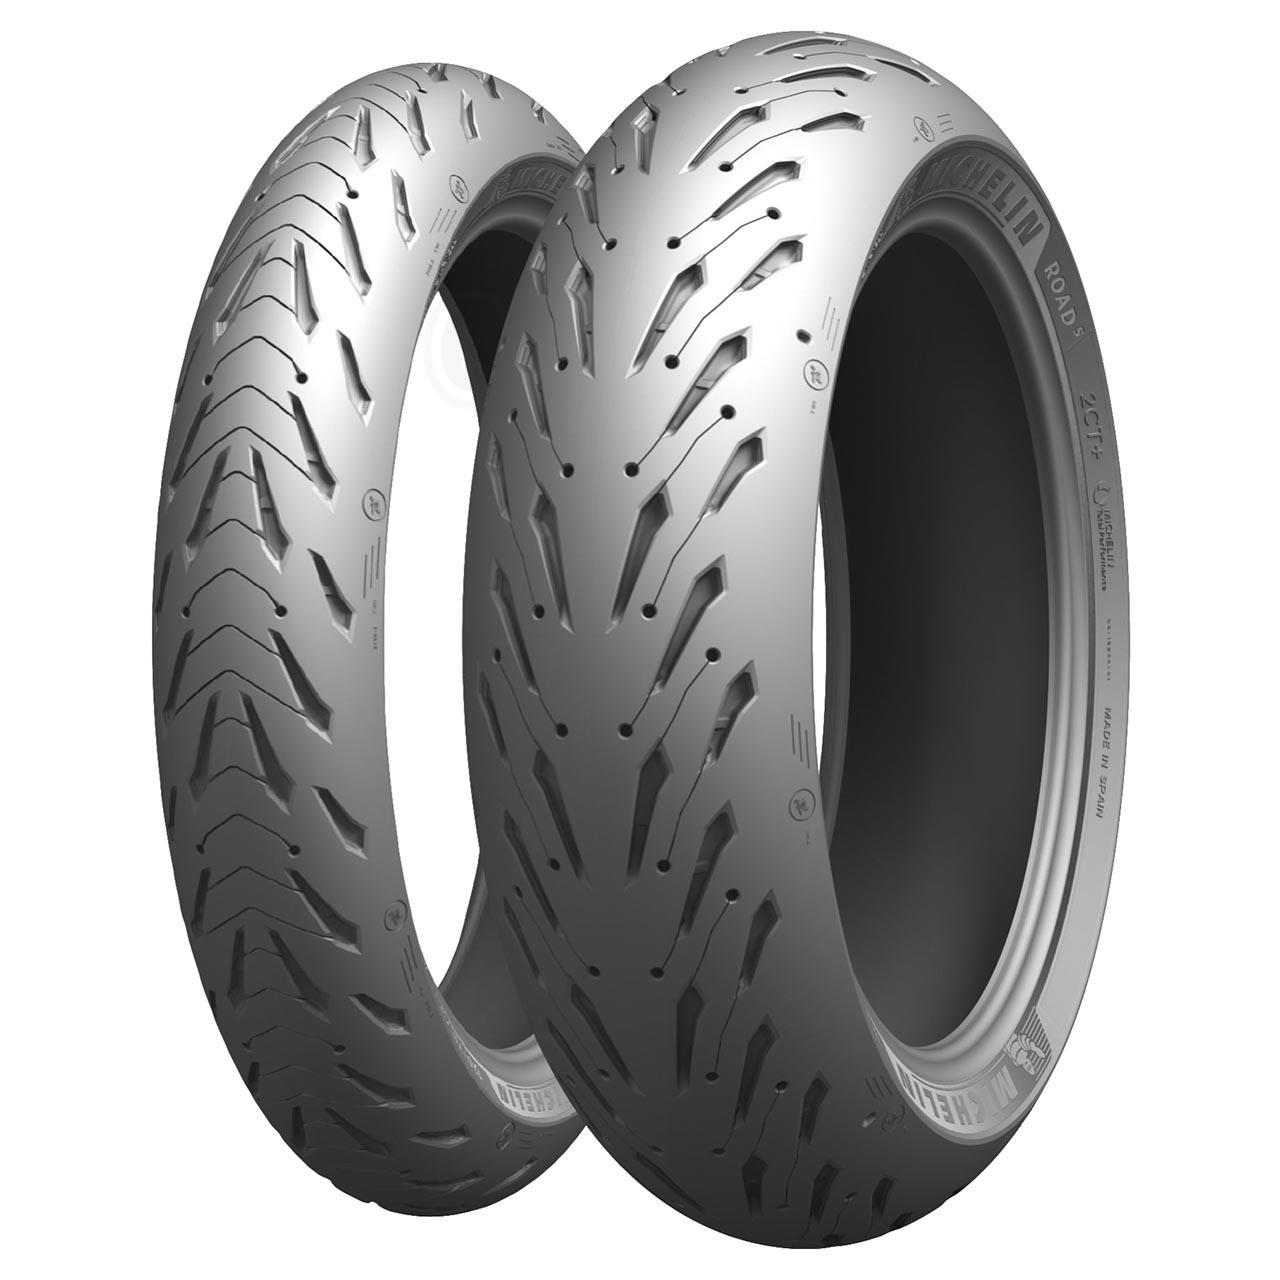 Michelin Road 5 GT RT 180/55ZR17 (73W) TL